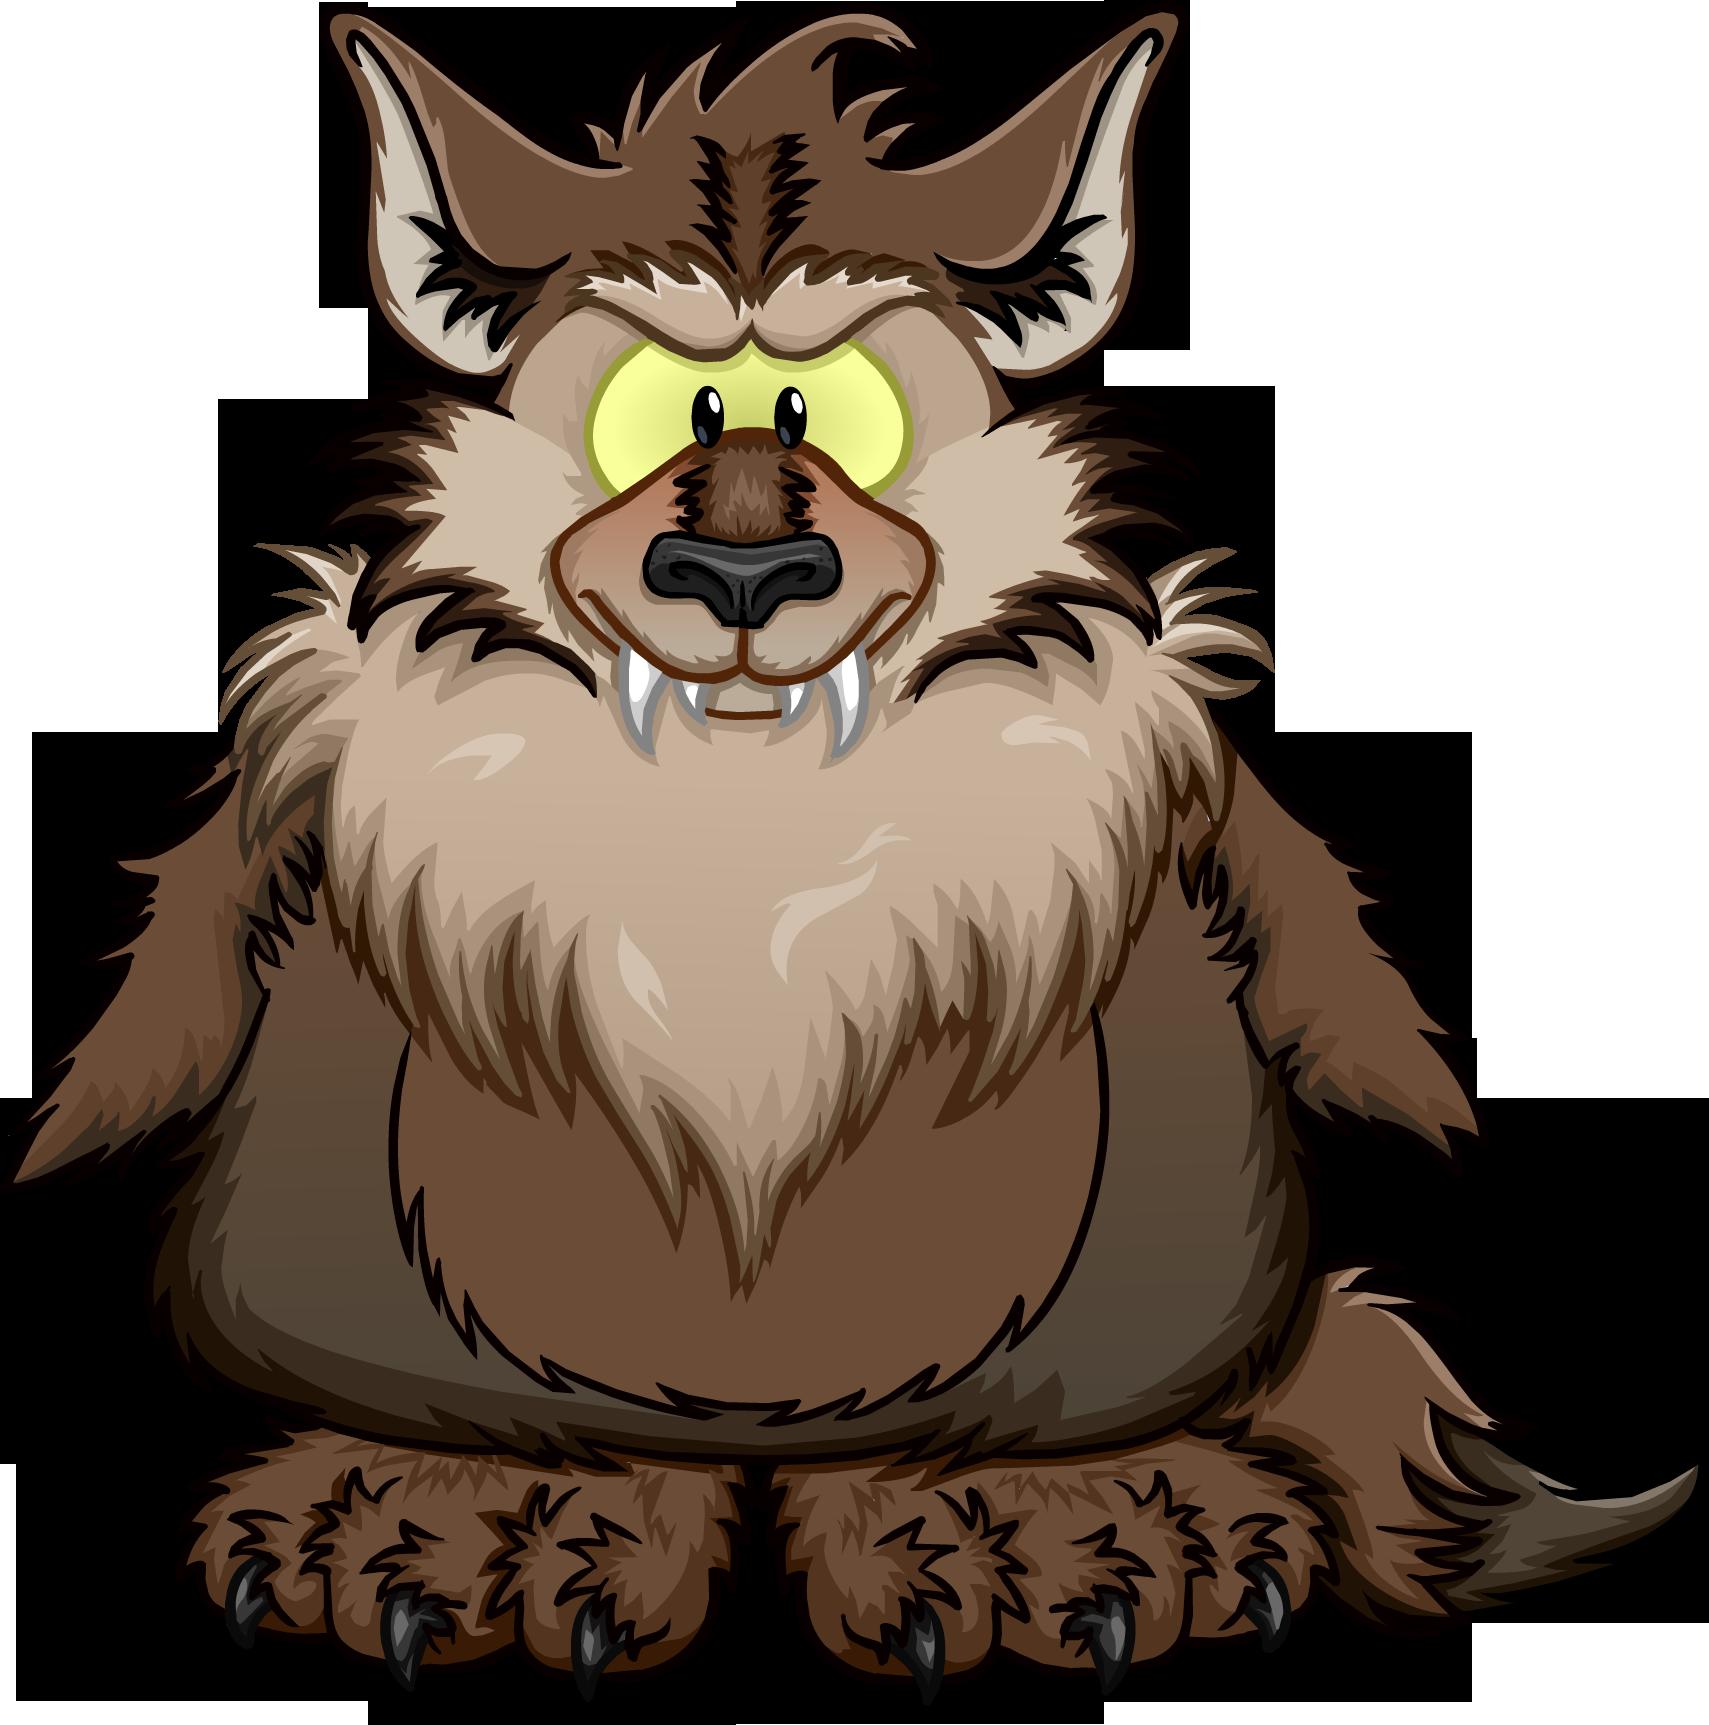 Halloween werewolf clipart vector transparent library 28+ Collection of Werewolf Clipart Png | High quality, free cliparts ... vector transparent library